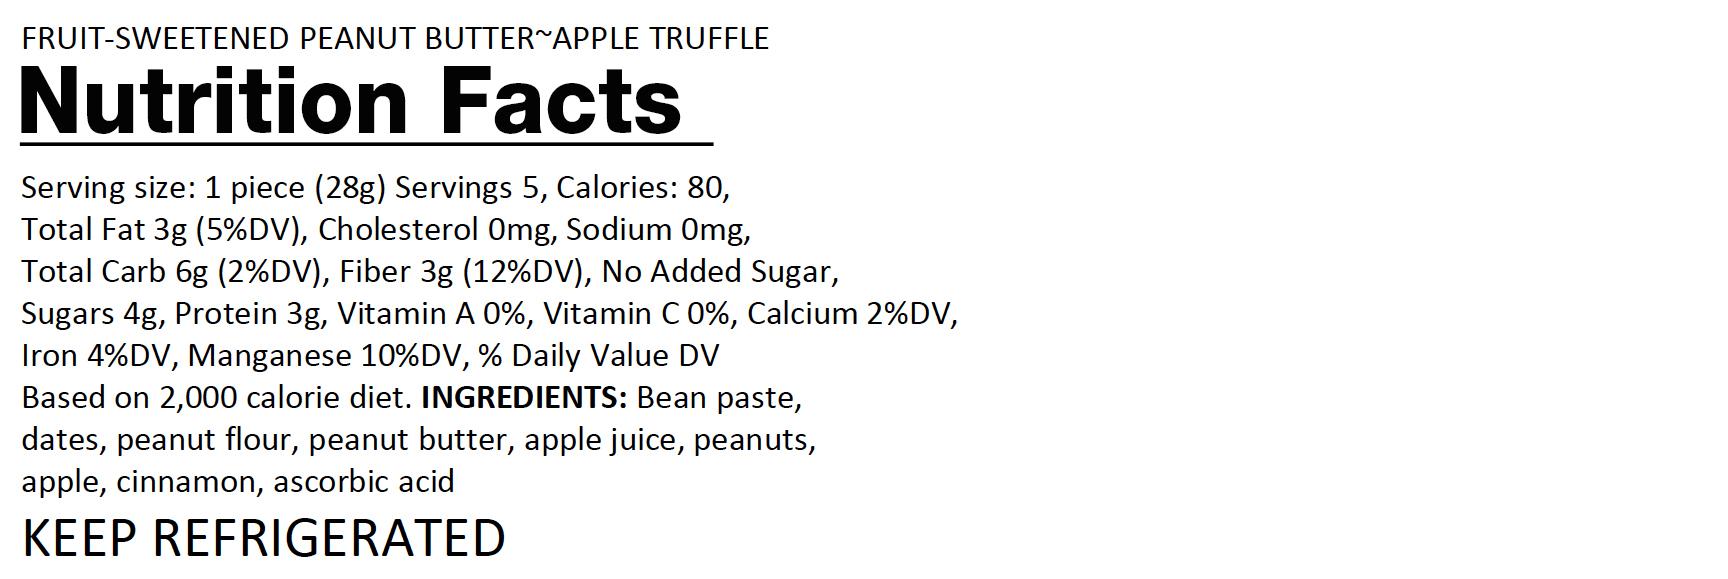 pbutter-truffle-nut-facts.jpg